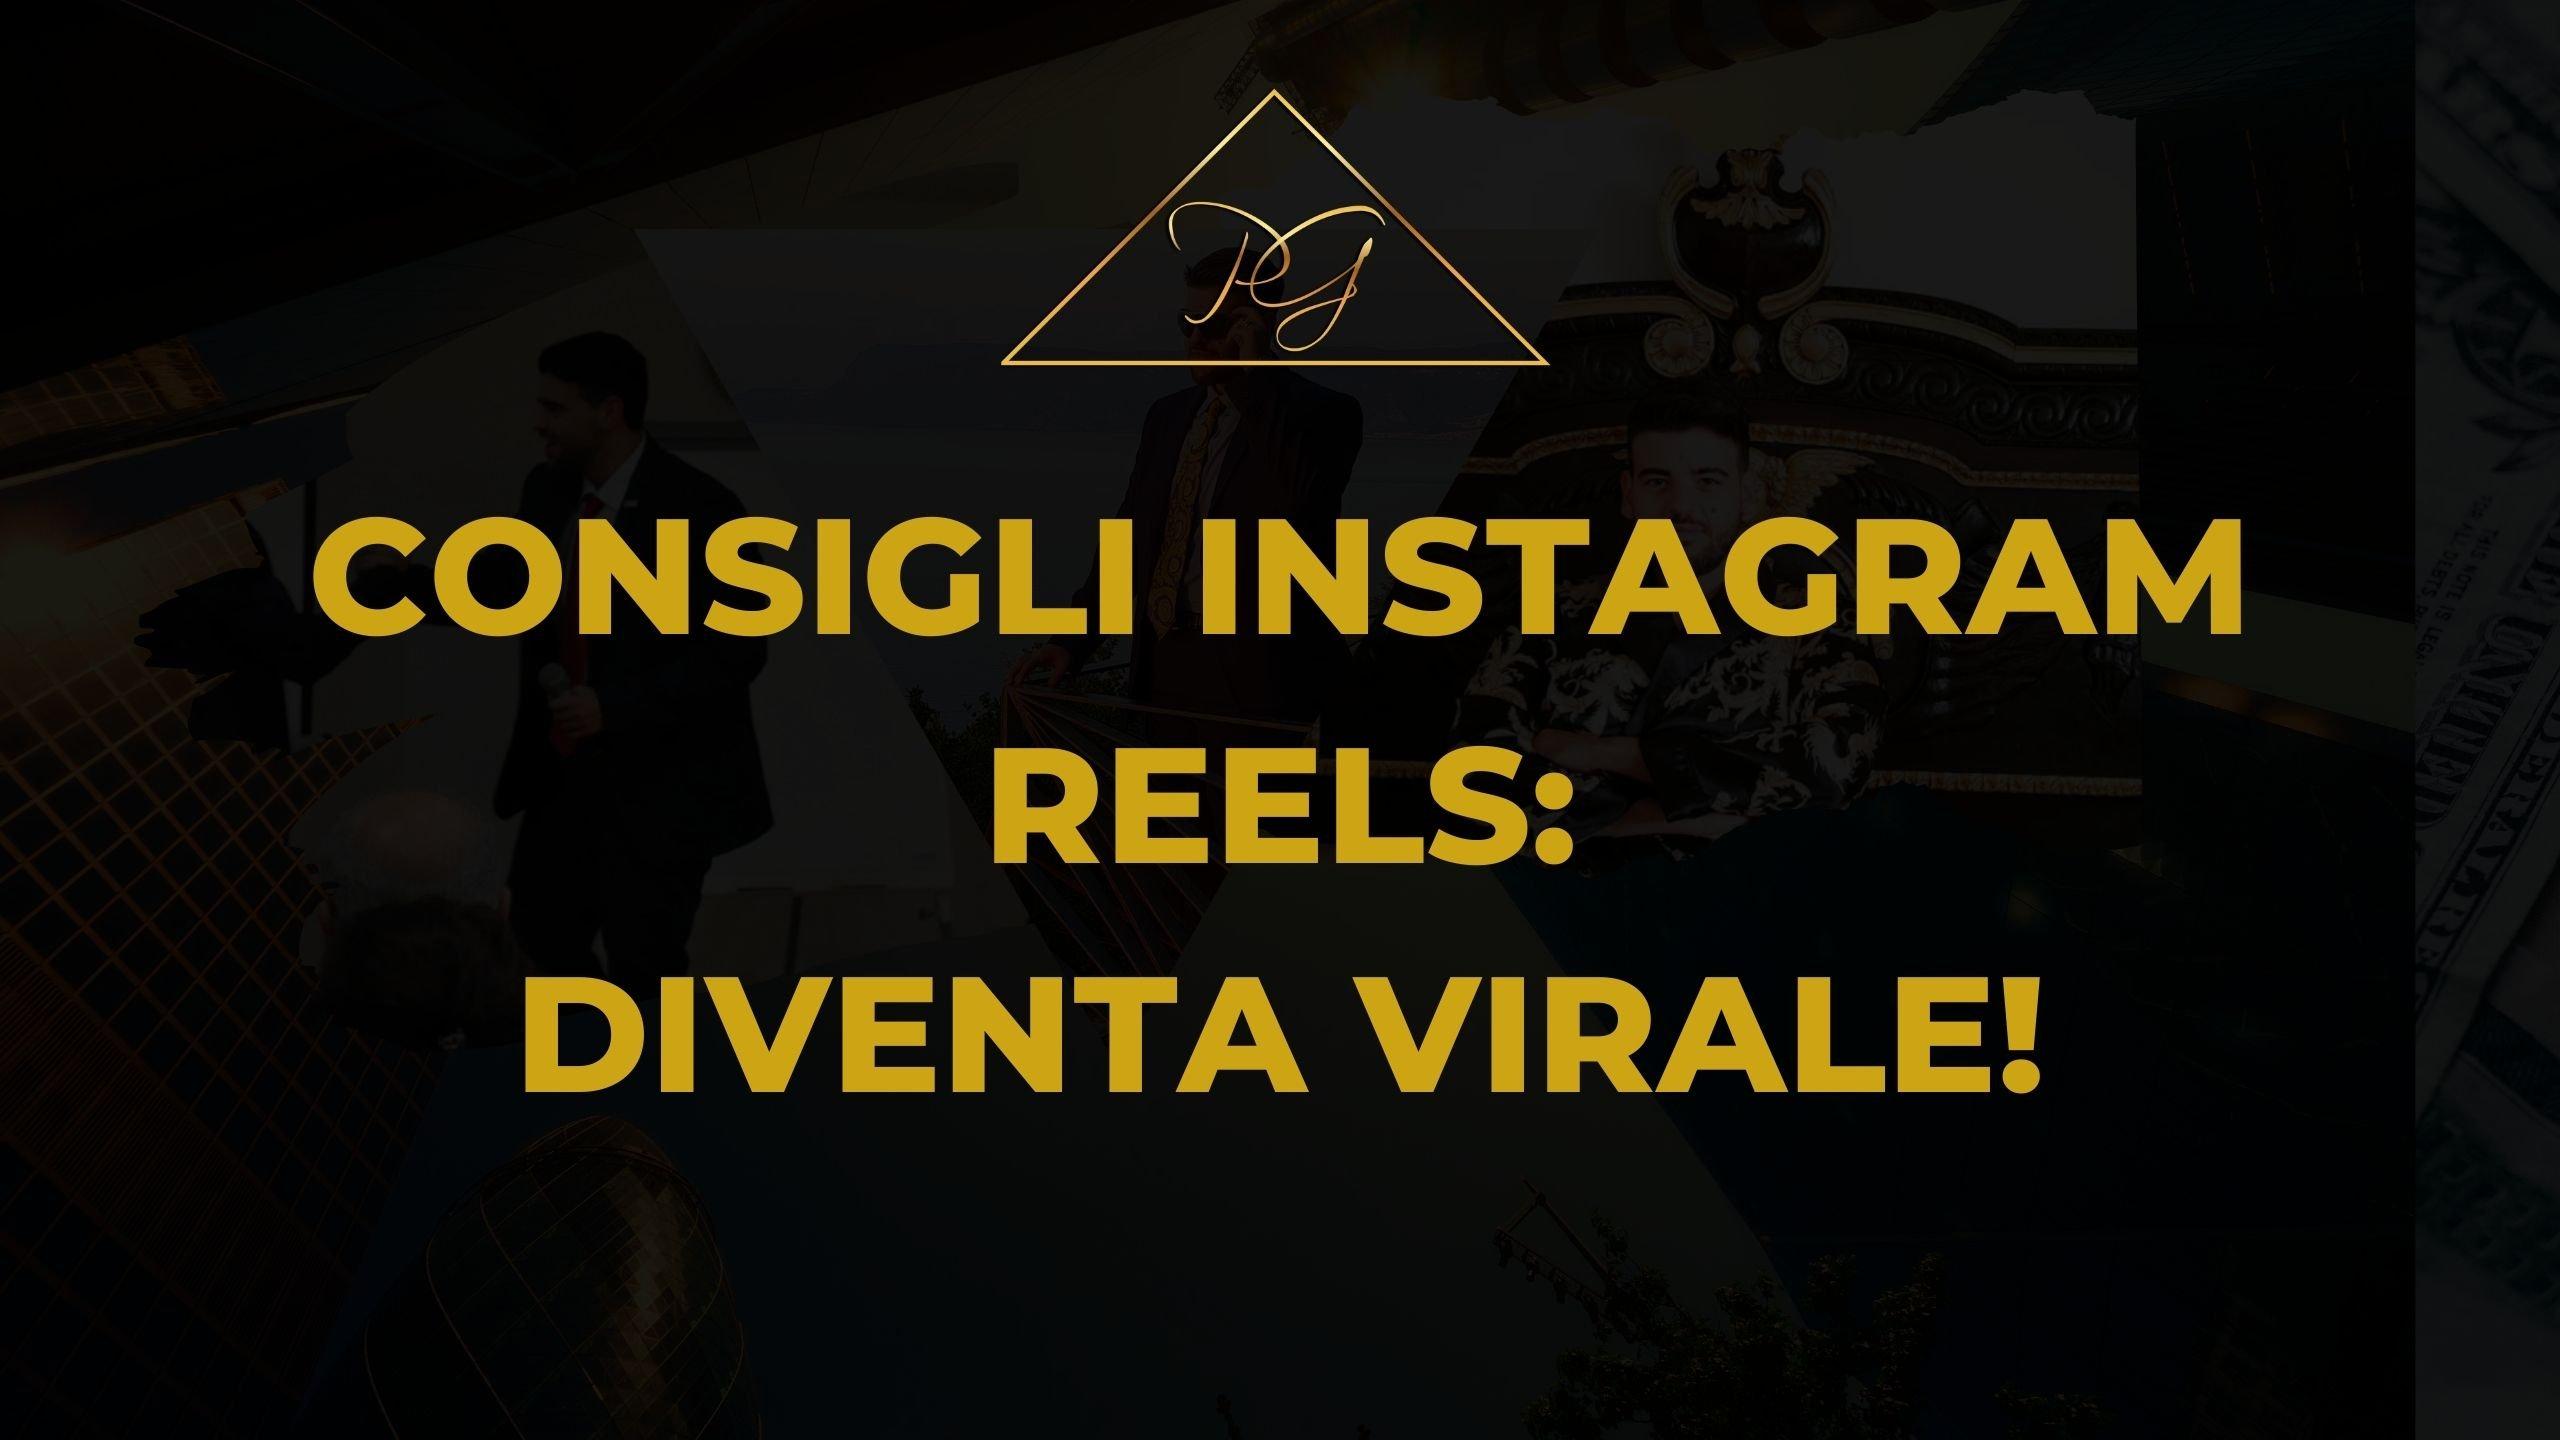 consigli instagram reels diventa virale